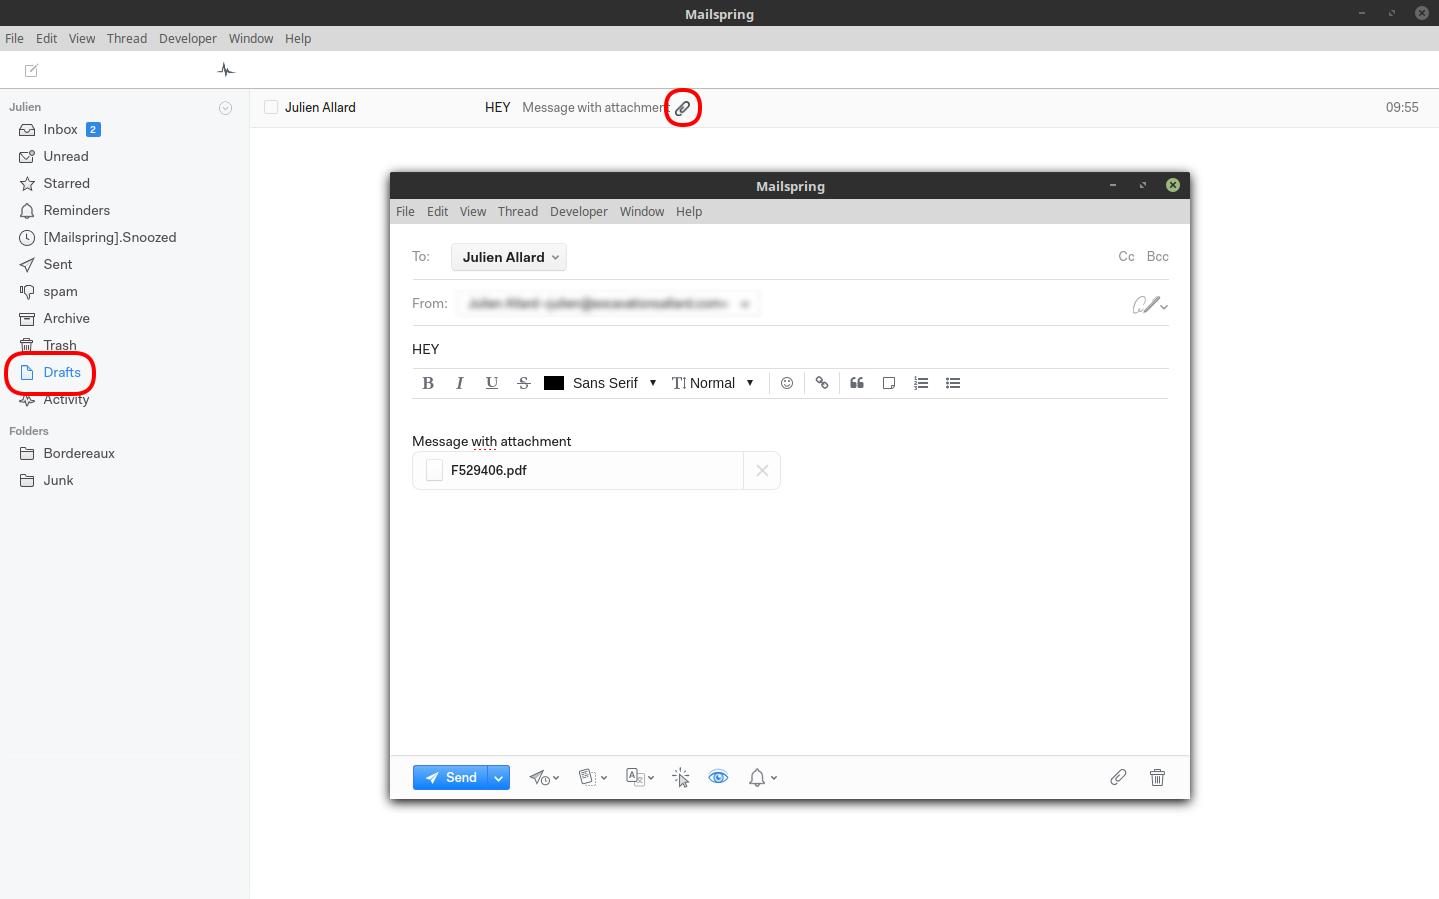 No progressbar or alert or file attachment upload · Issue